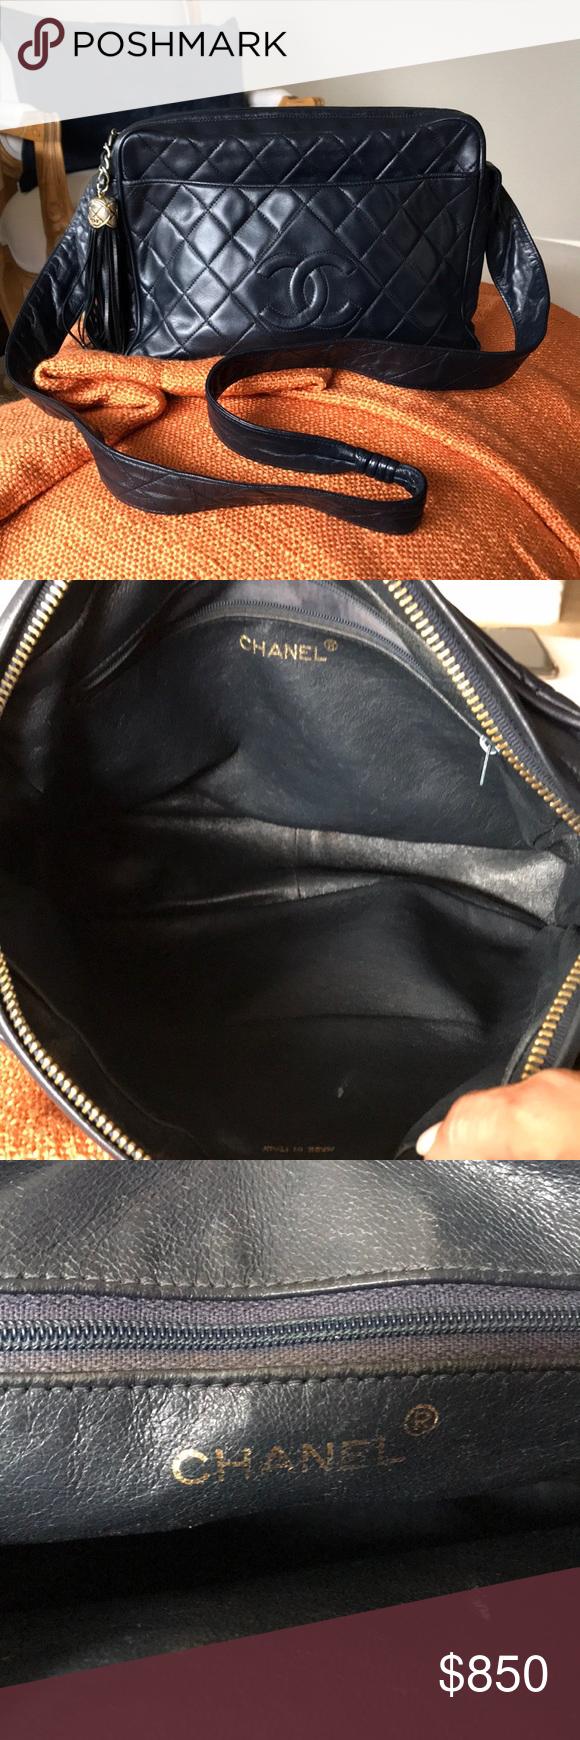 Vintage Chanel Crossbody Camera Bag Chanel Crossbody Vintage Chanel Bags